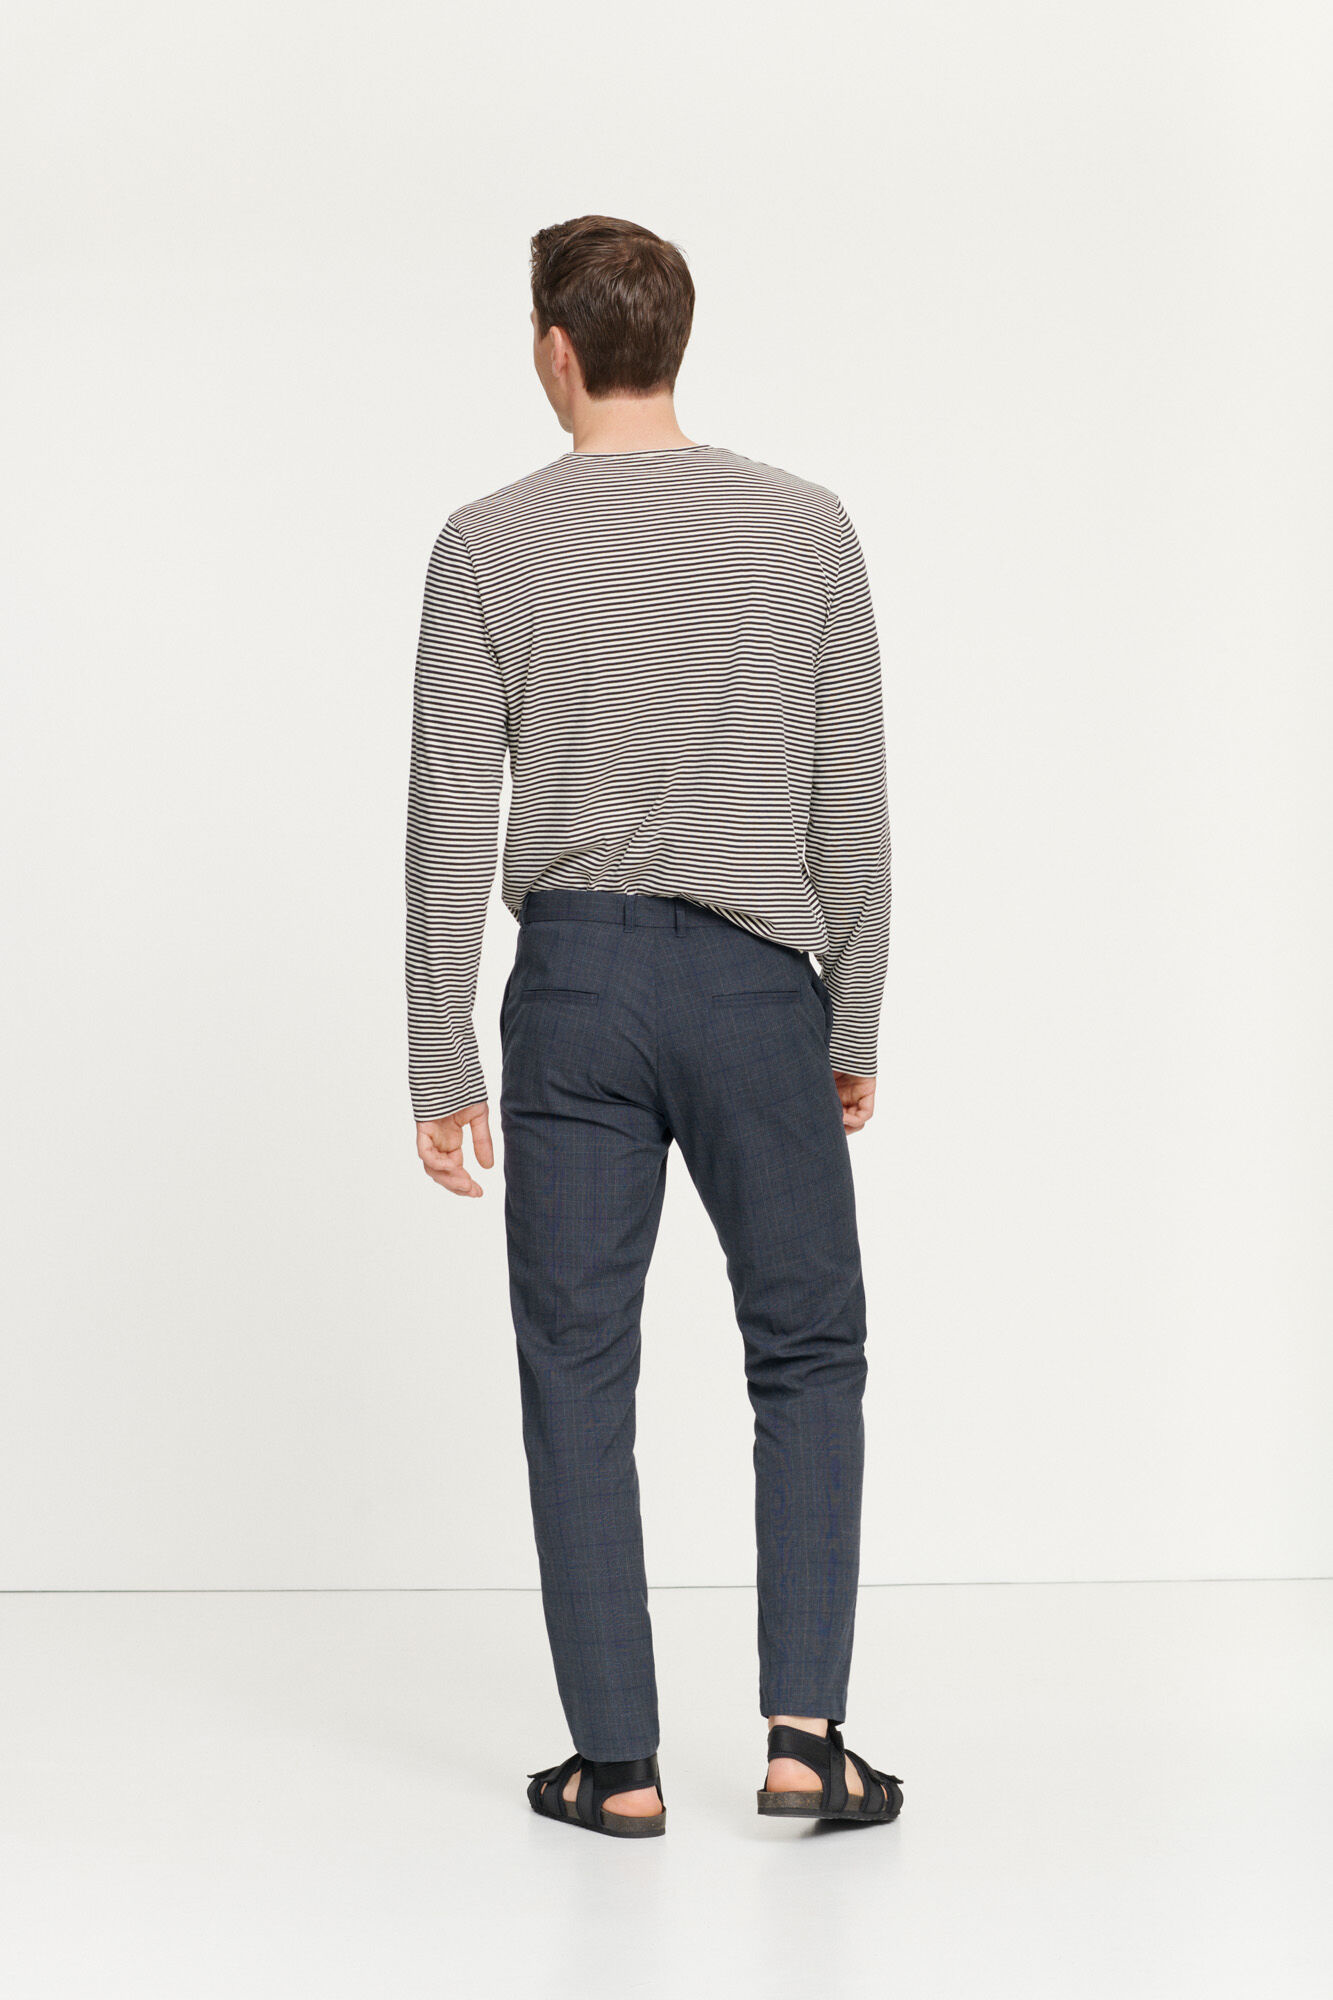 Frankie Regular Fit broek blauw geruit 11538-3